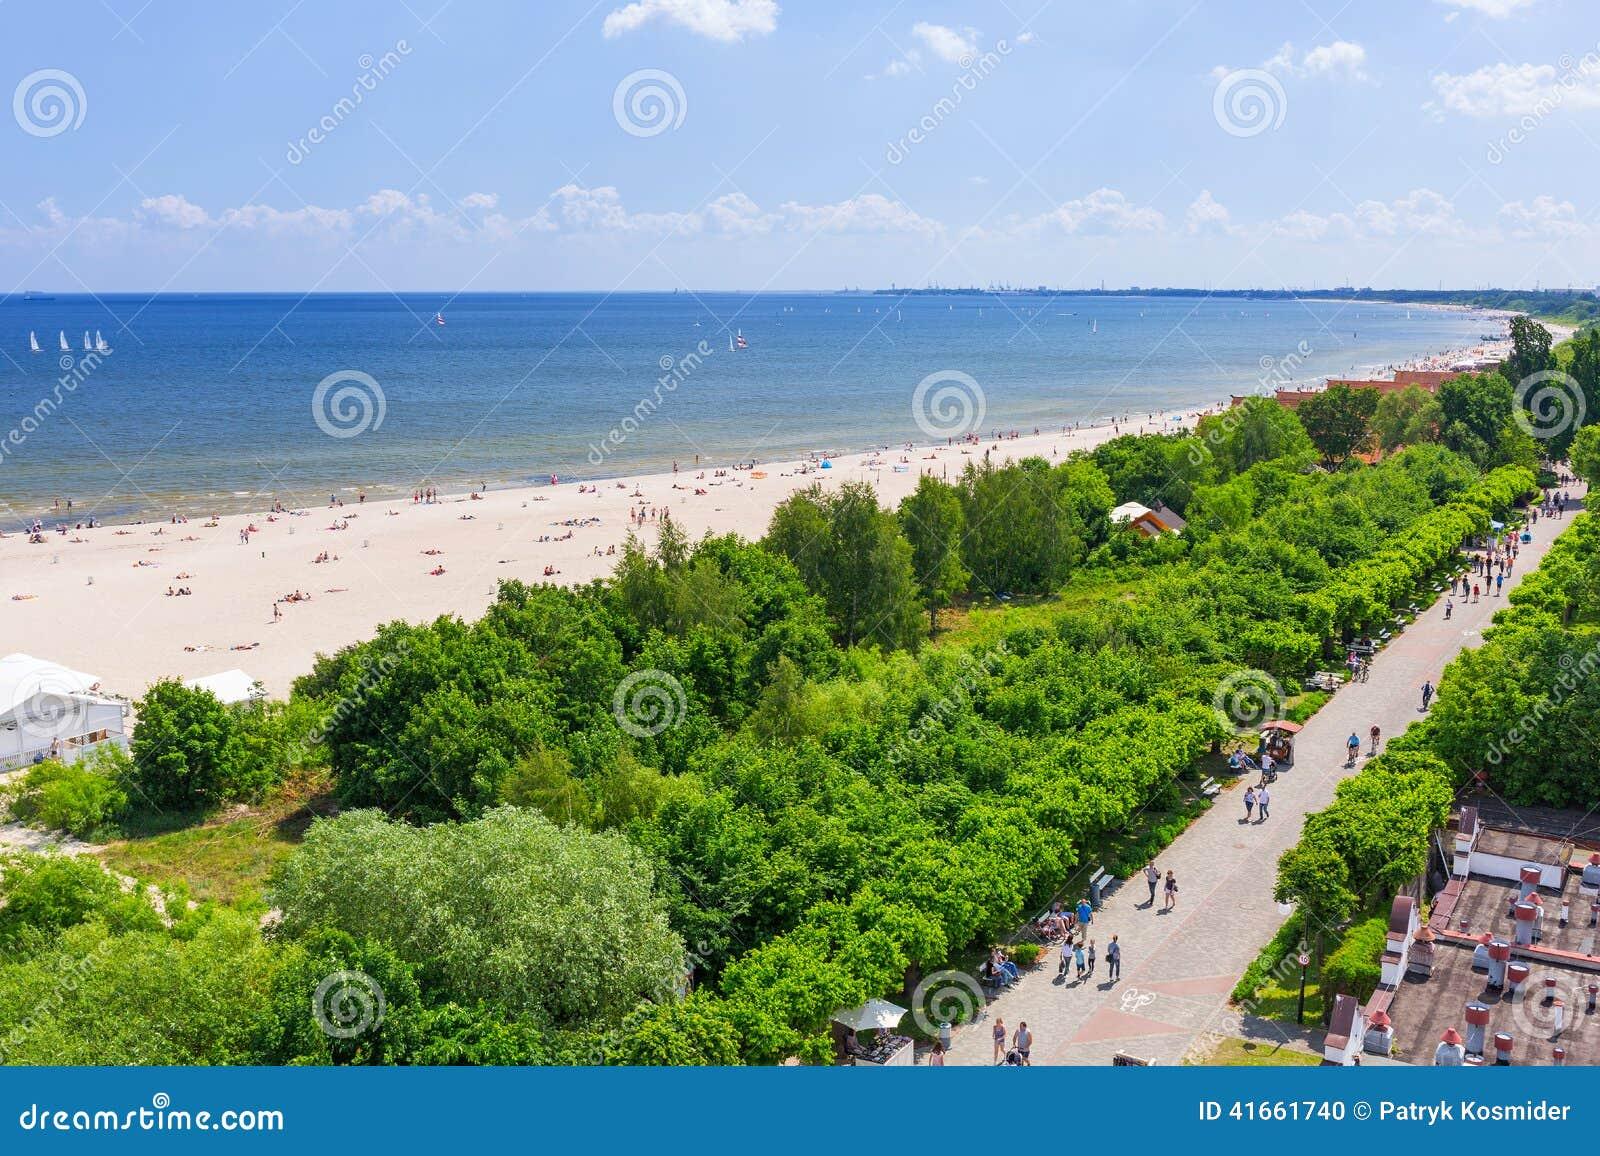 Люди на пляже Sopot на Балтийском море